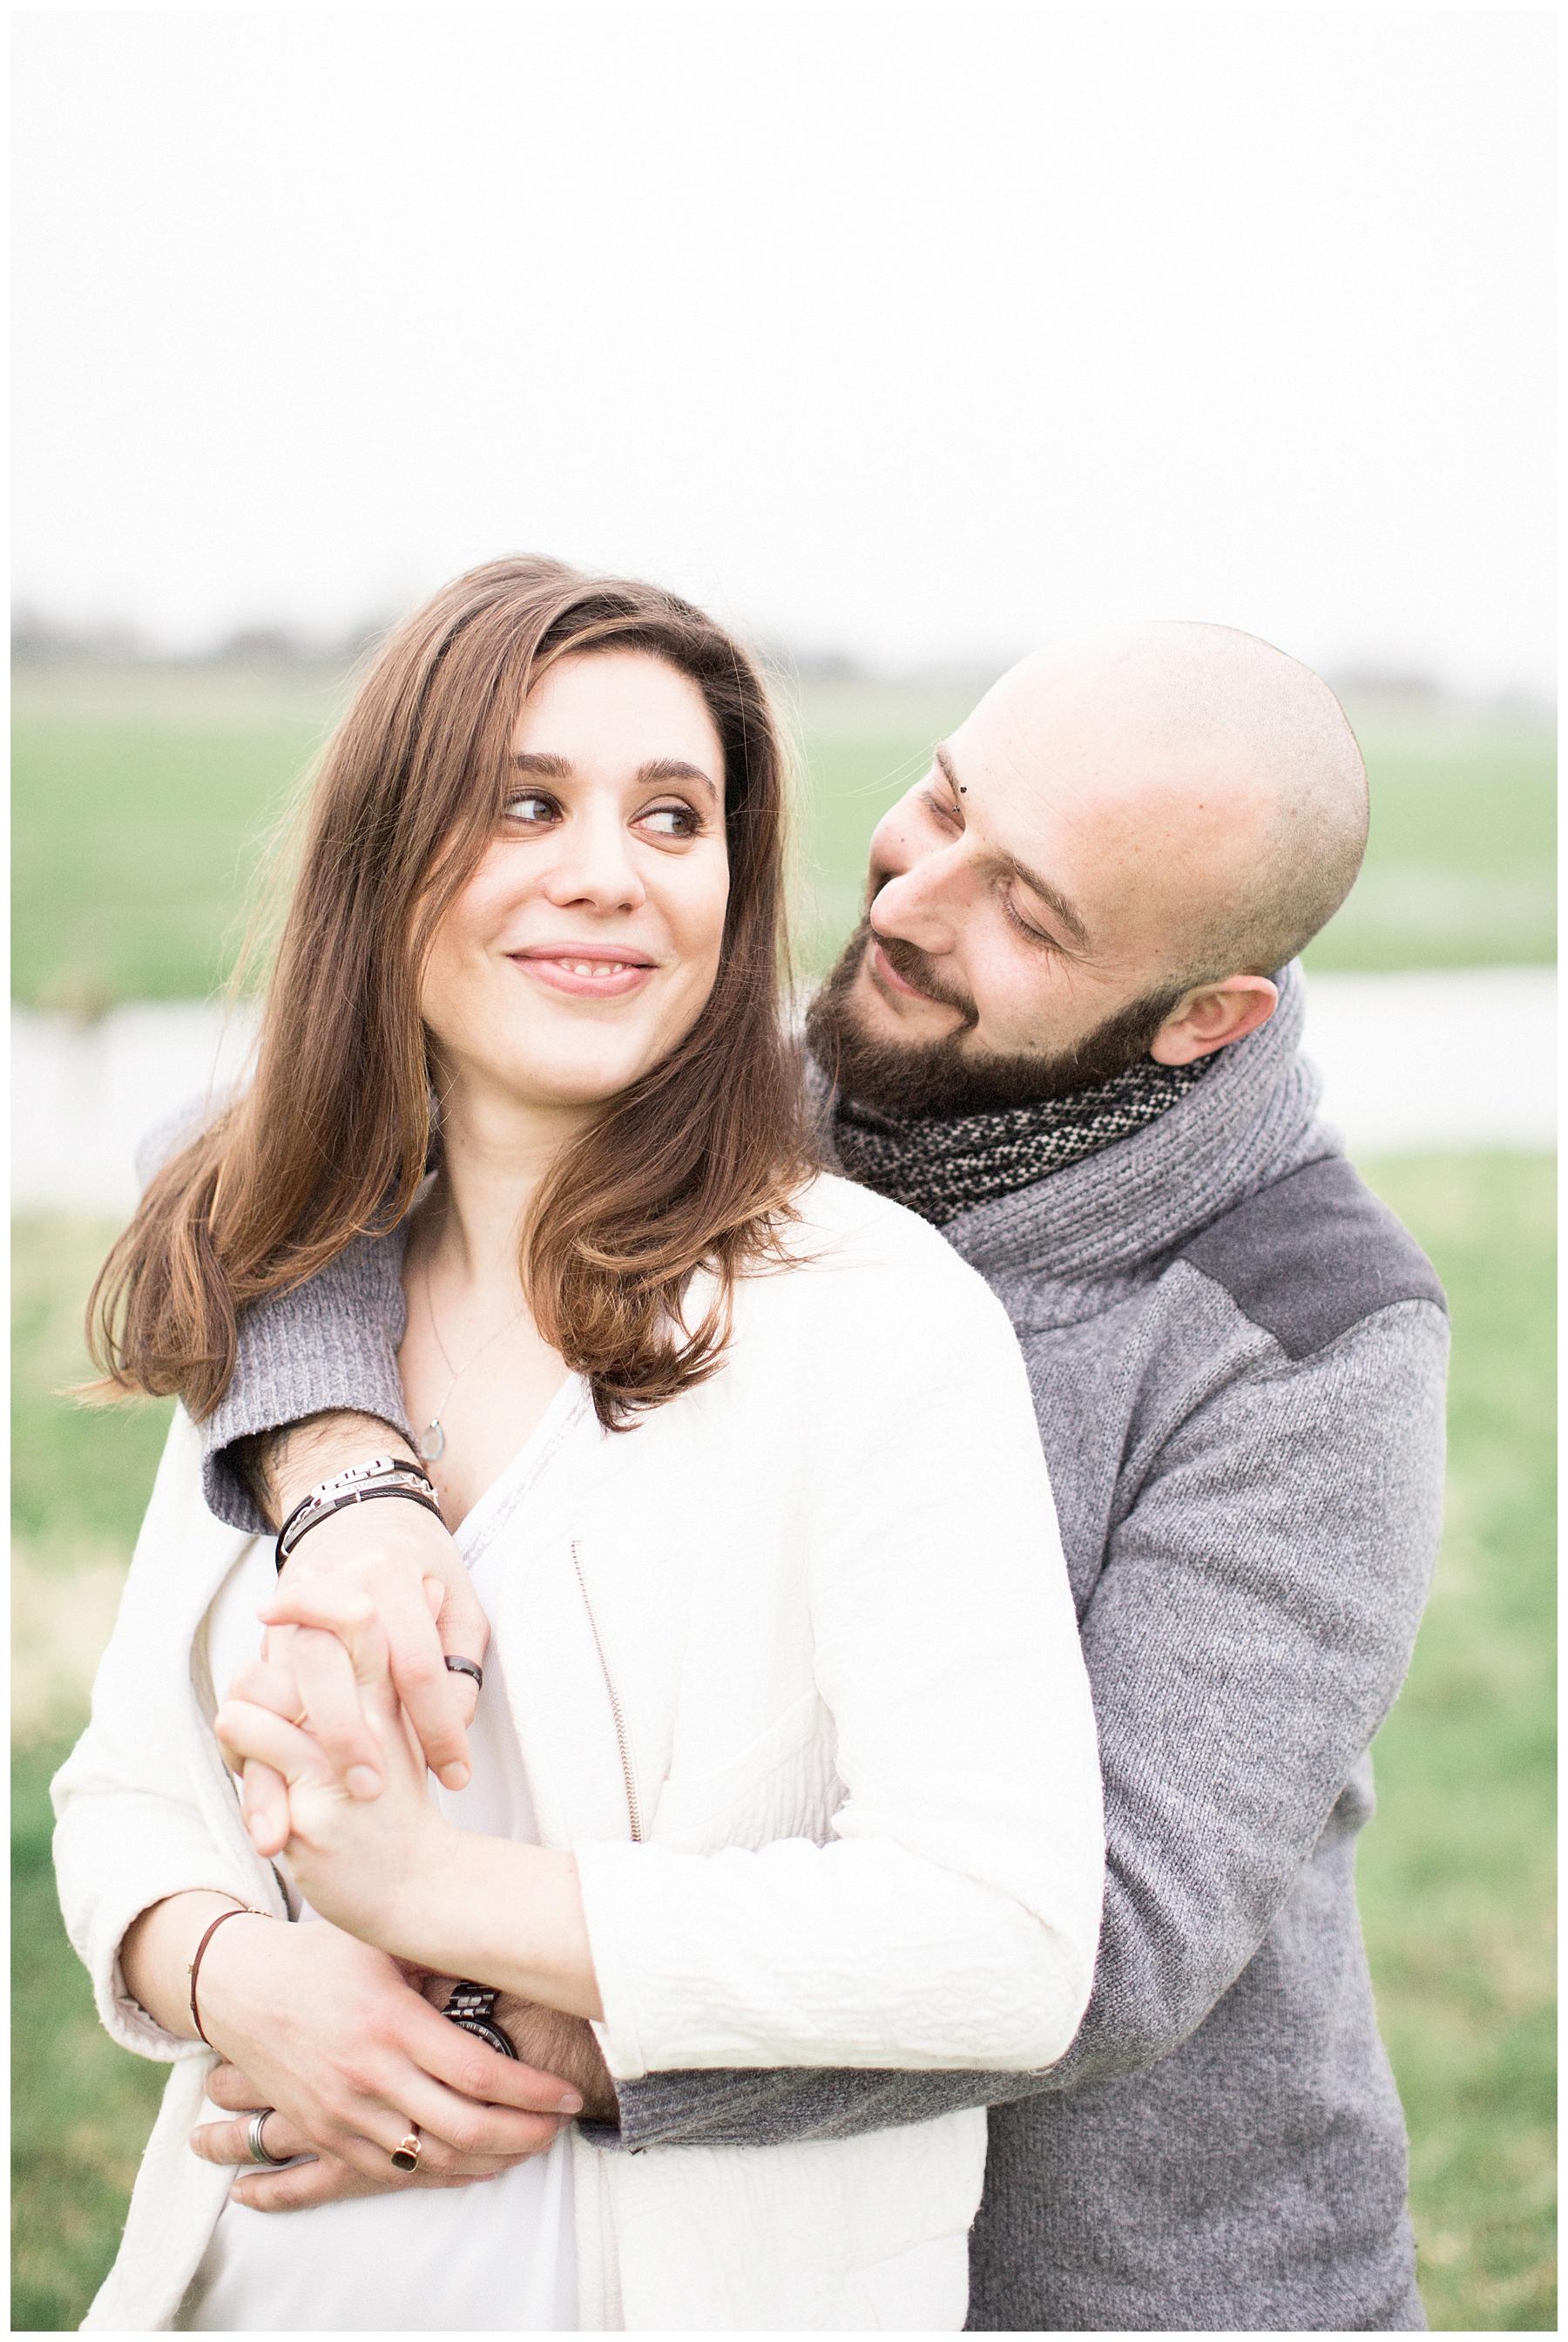 Marie-Alice G-Photographe couple fiancailles valognes cherbourg manche normandie - photographe mariage france_0010